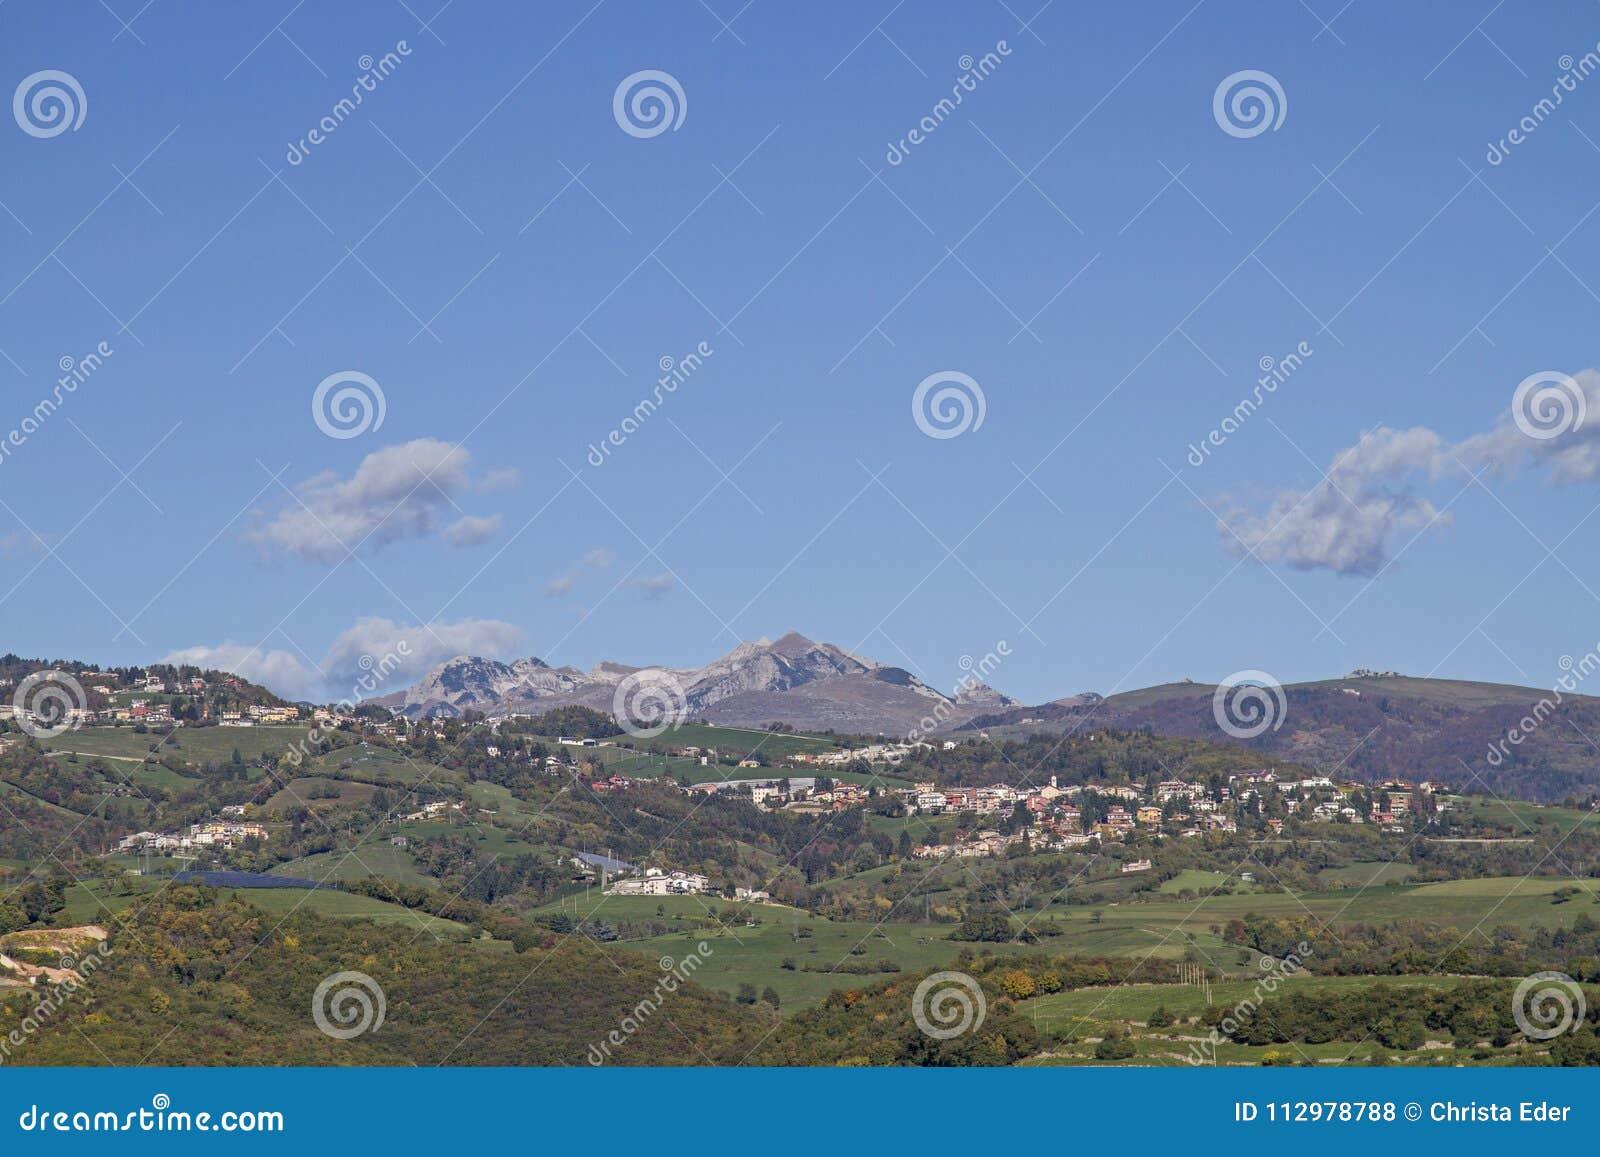 In the Monti Lessini mountains